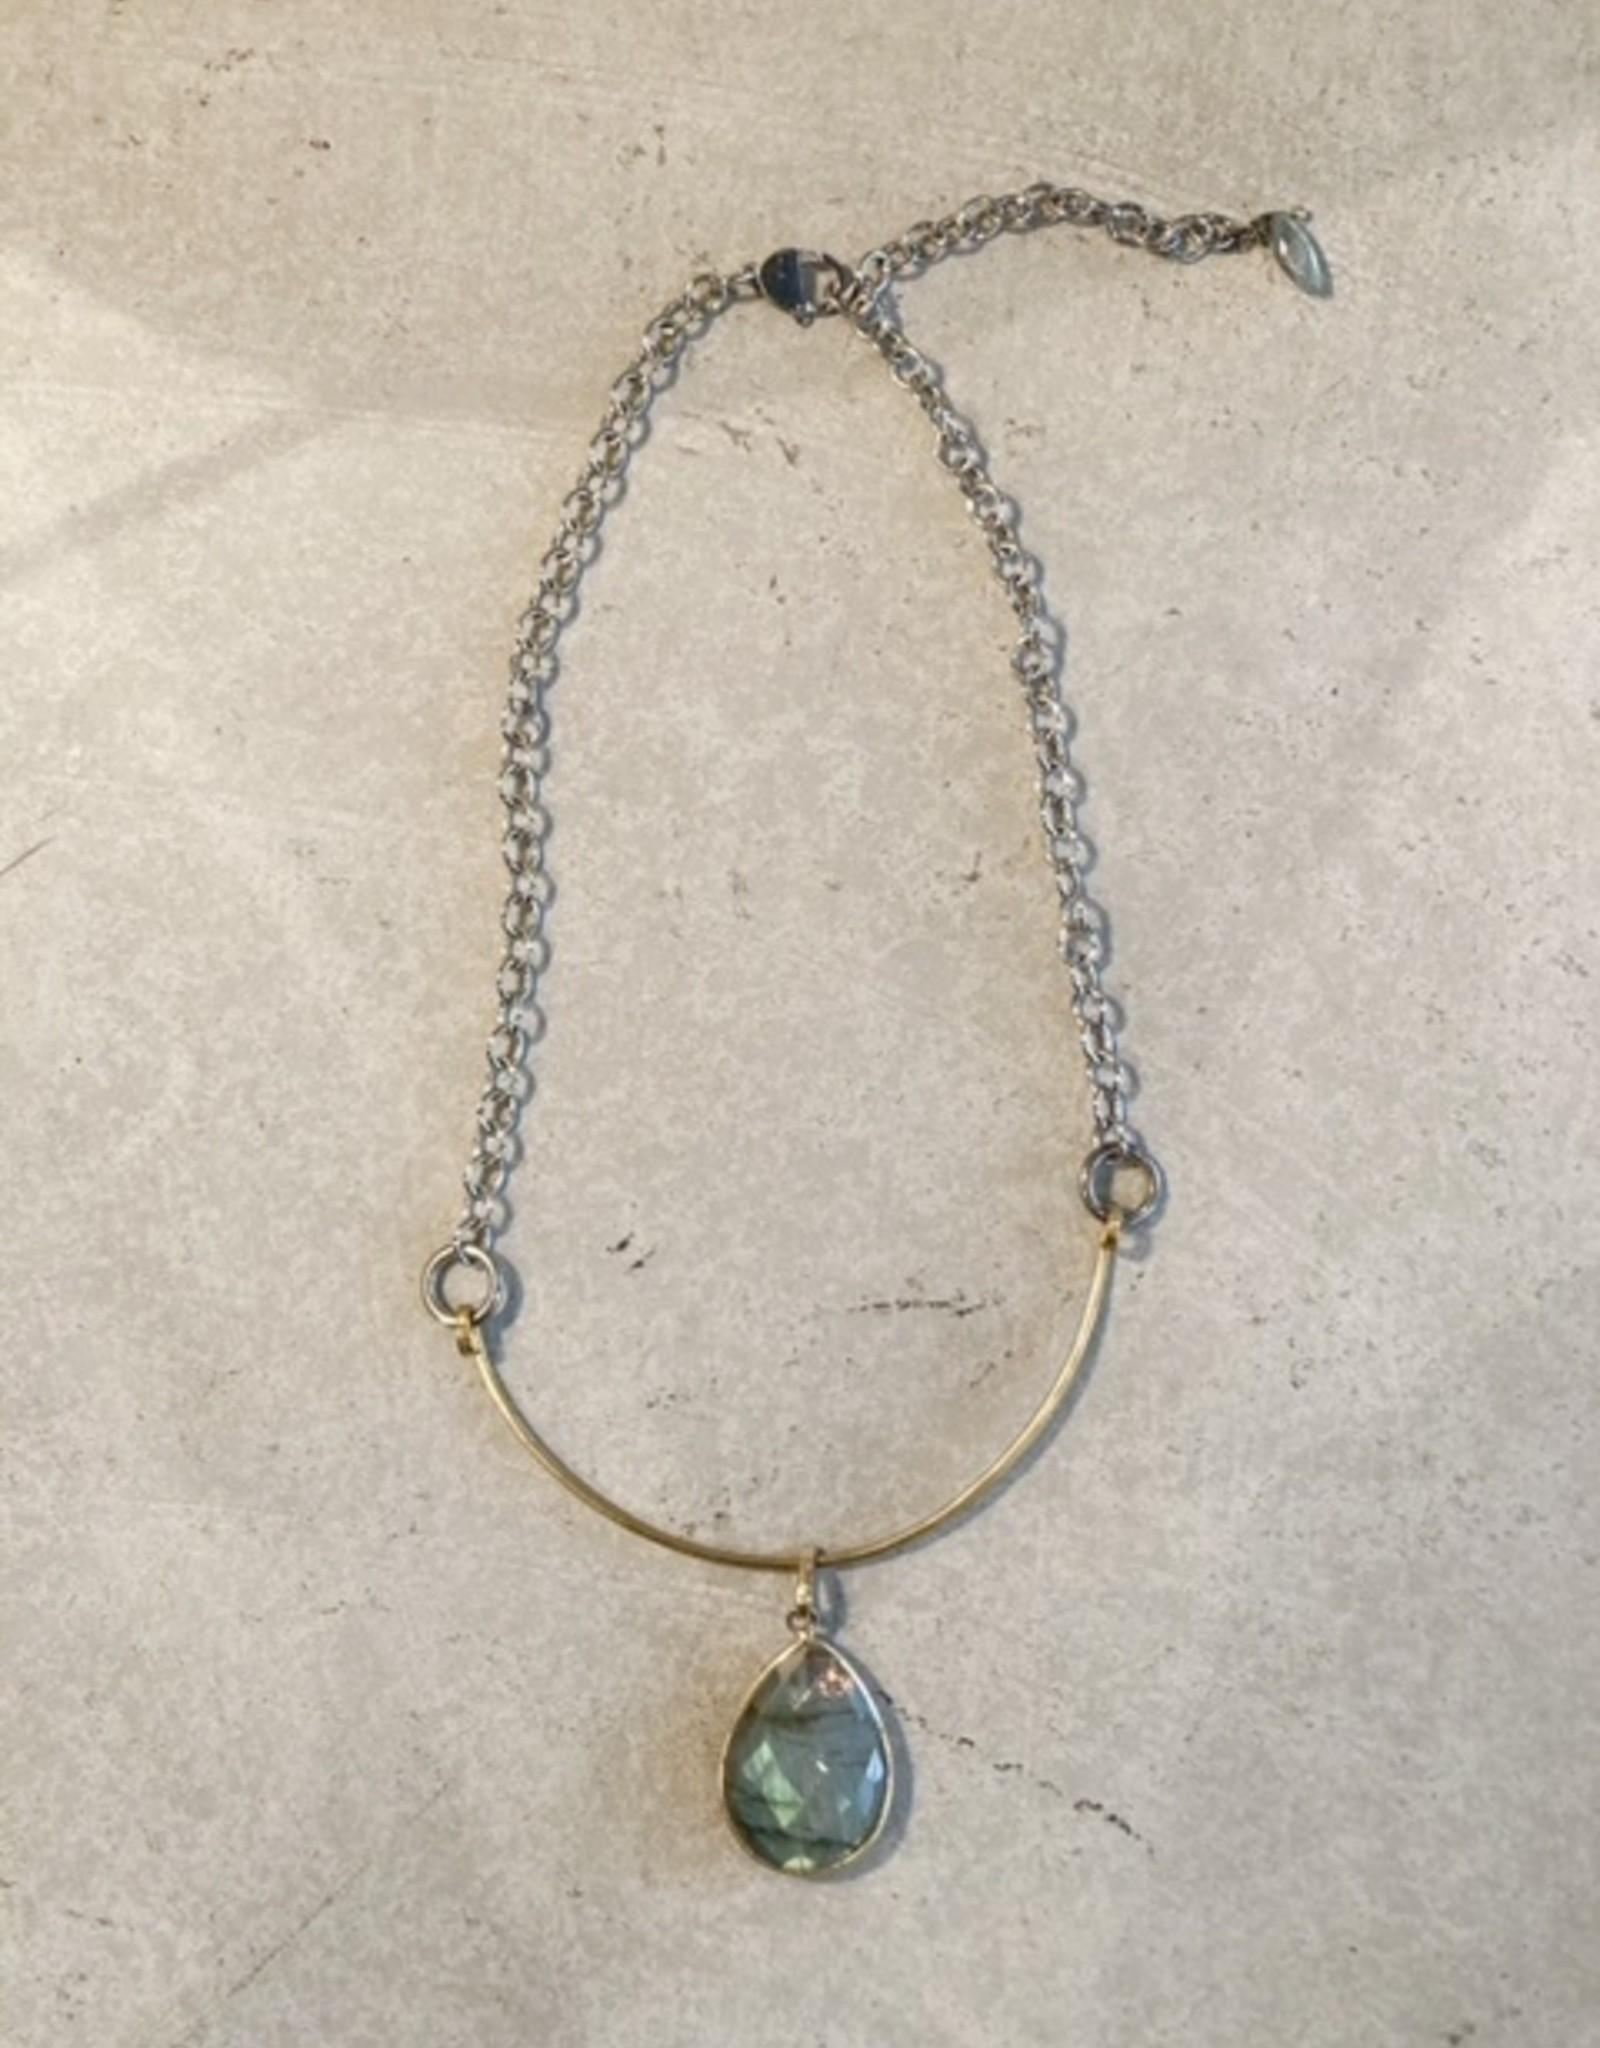 mixed metal labradorite necklace